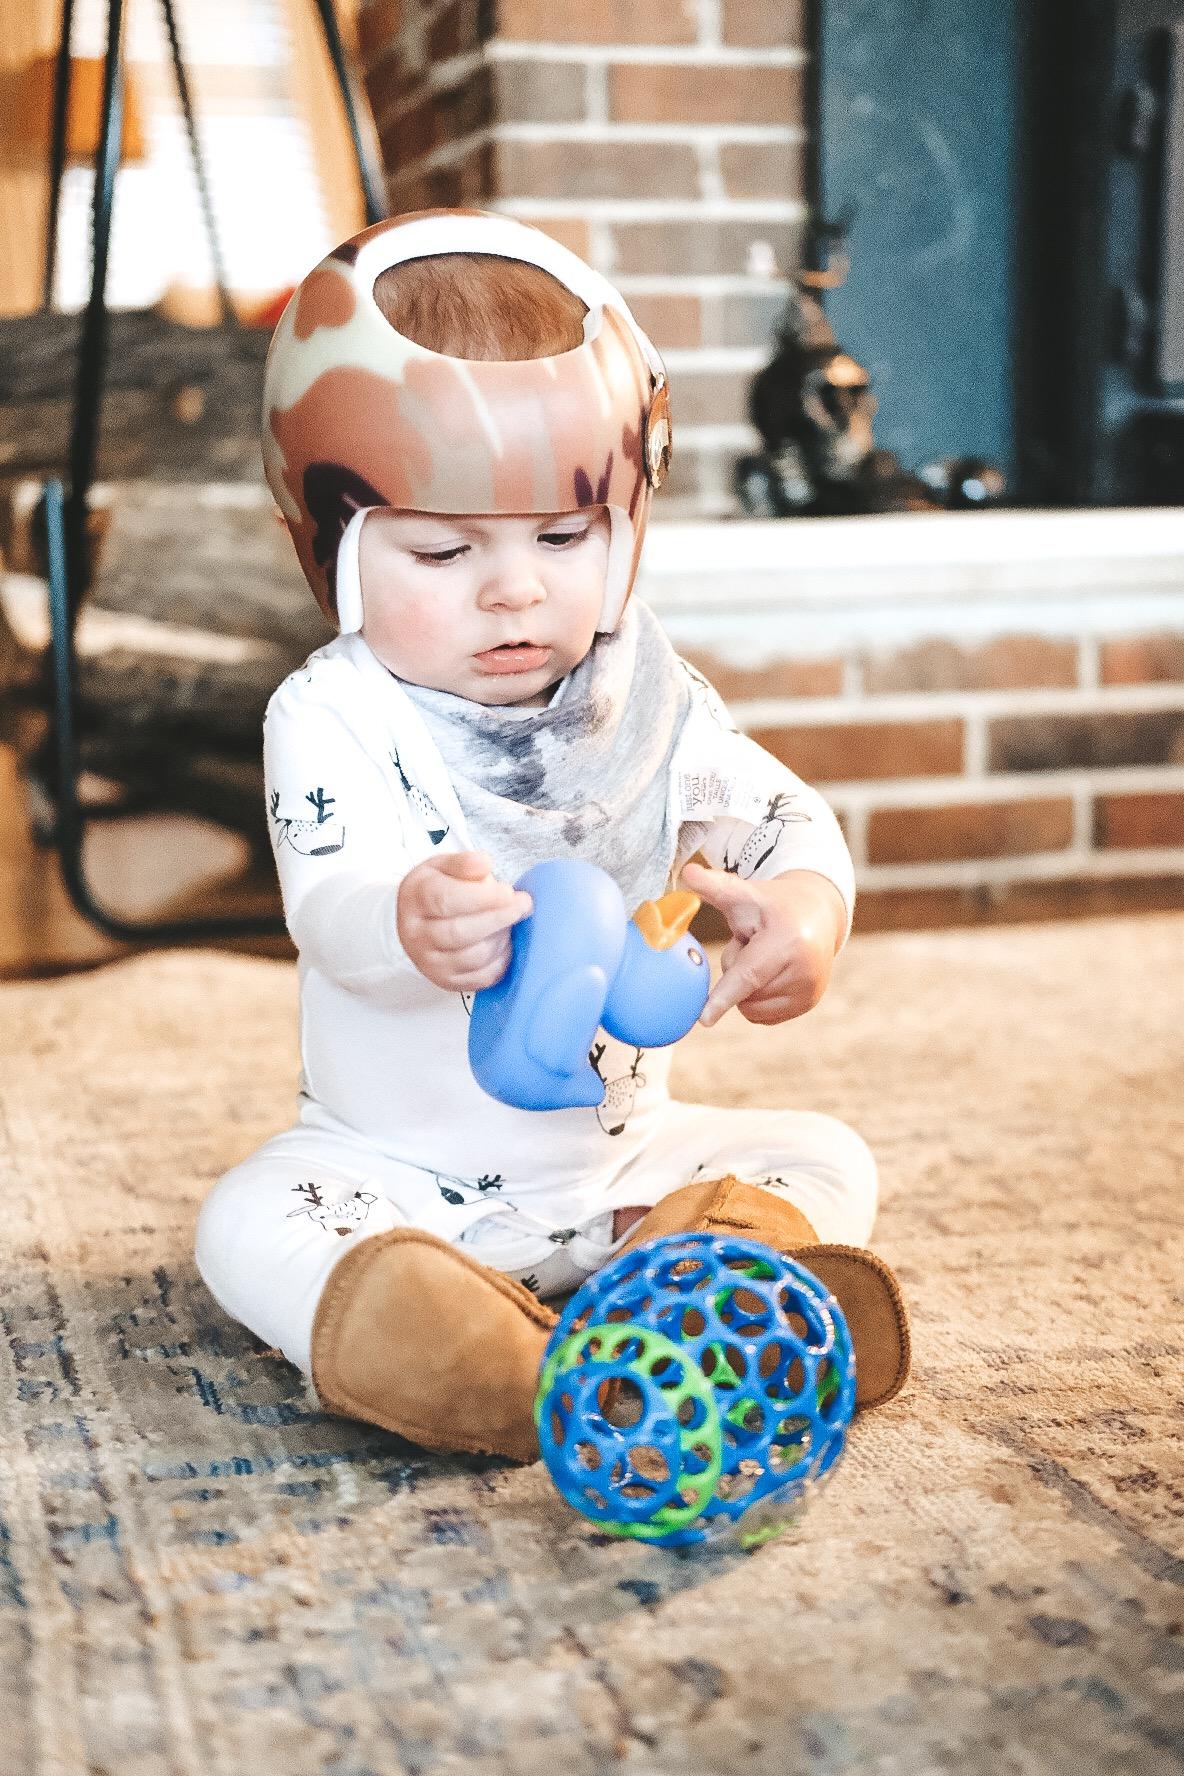 Jett Jones, 8 Months Old.  Baby Ugg Boots.  Starband helmet.